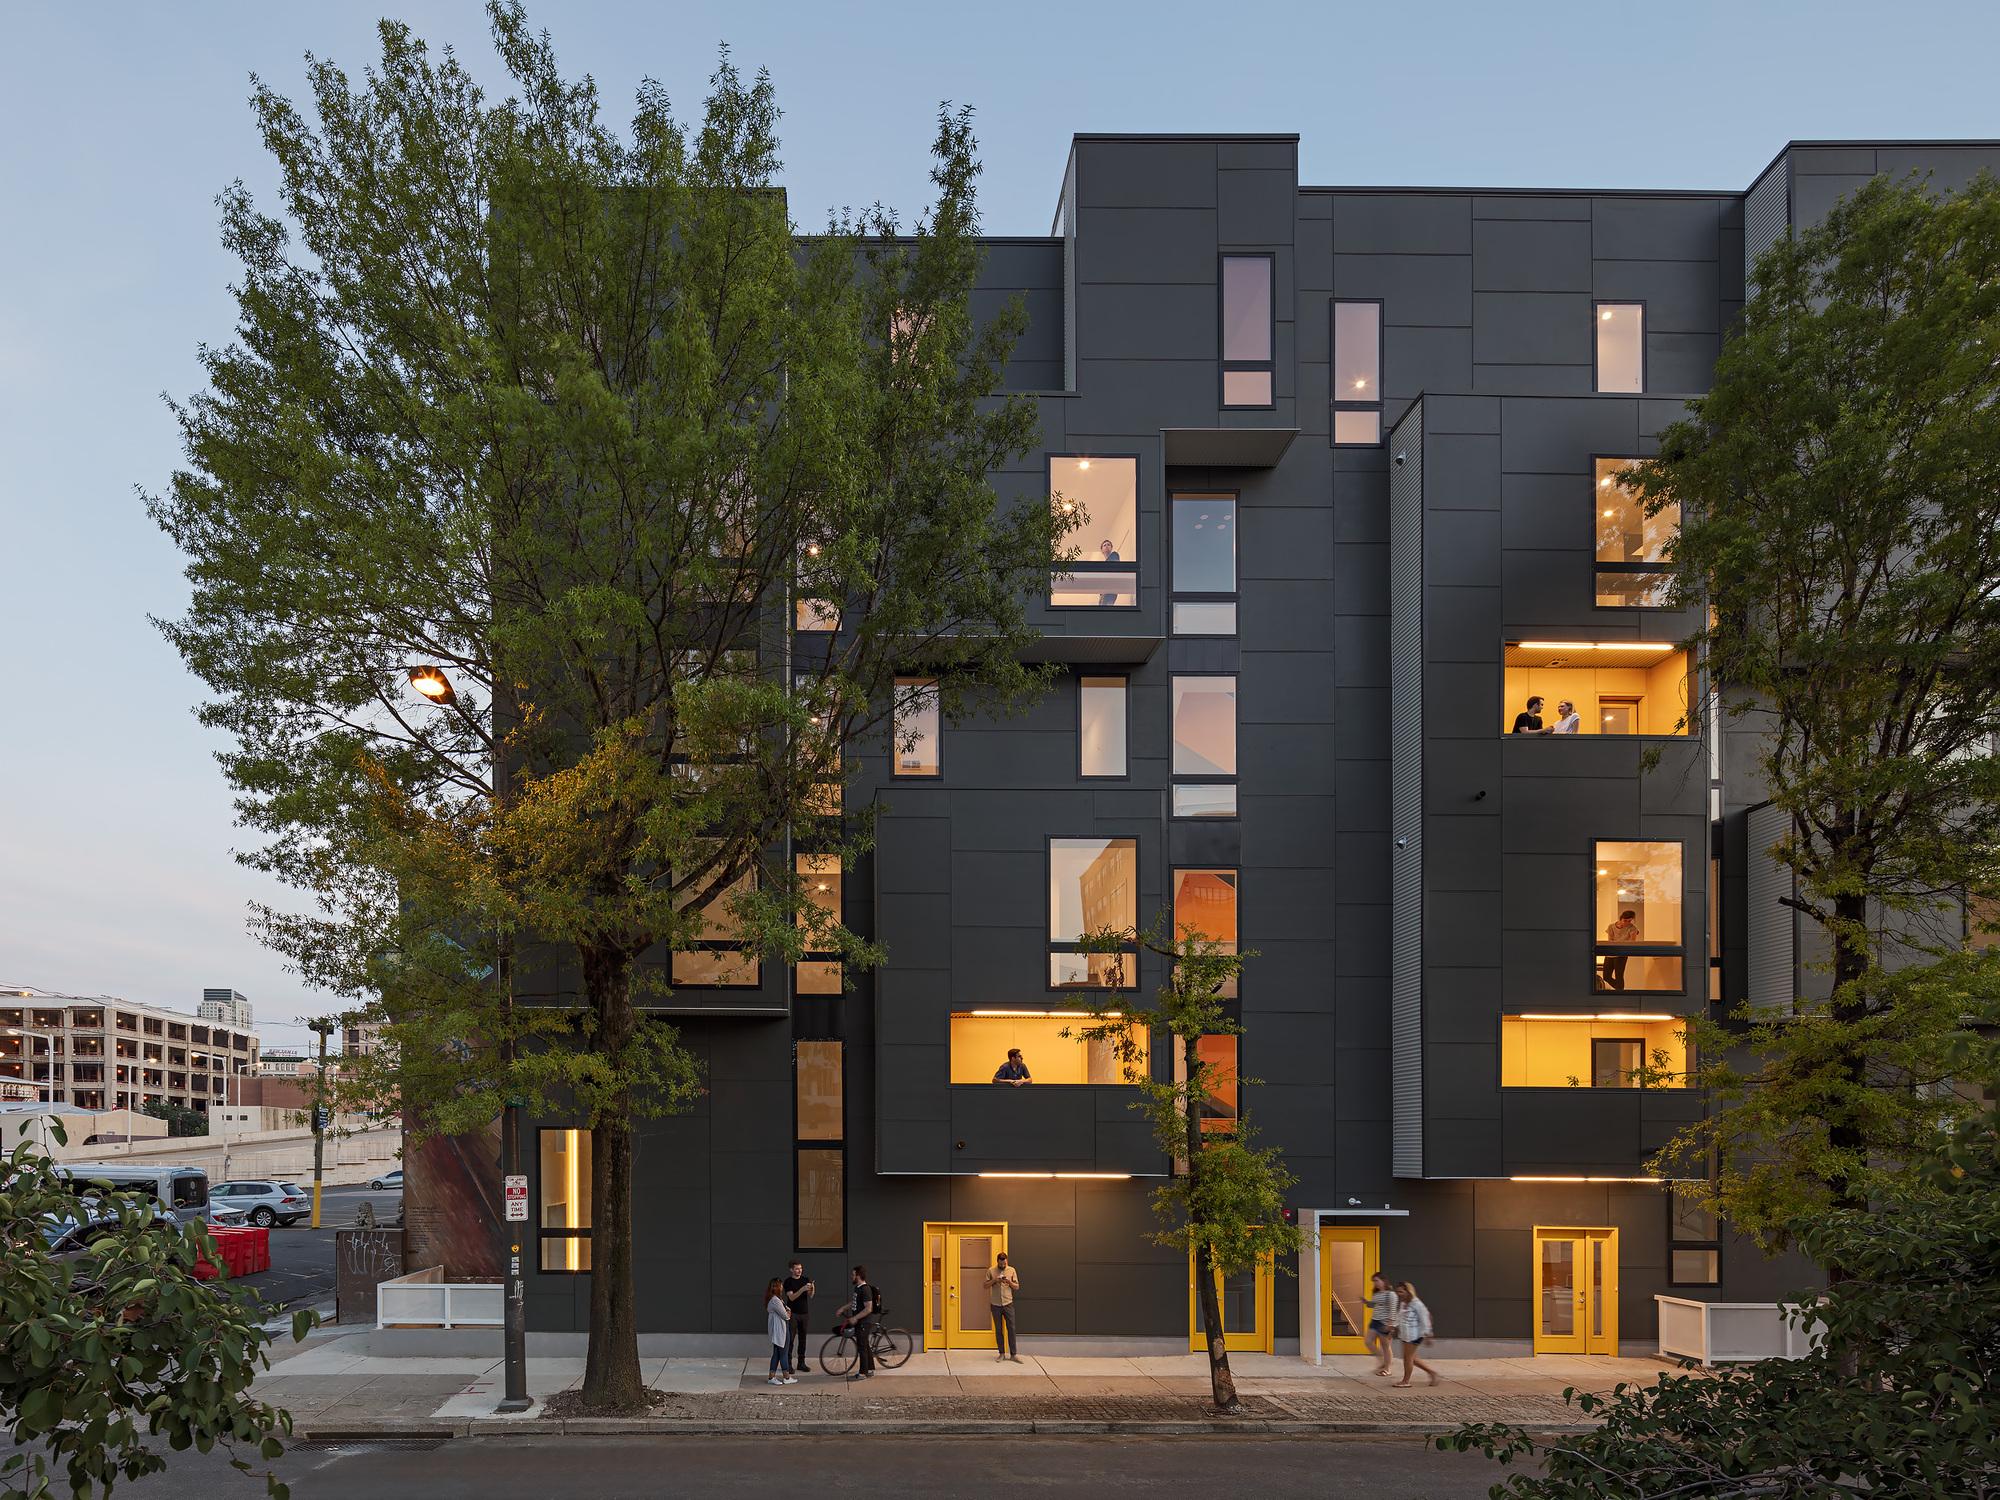 XS House Fiber Cement Facade, Photo by Sam Oberter